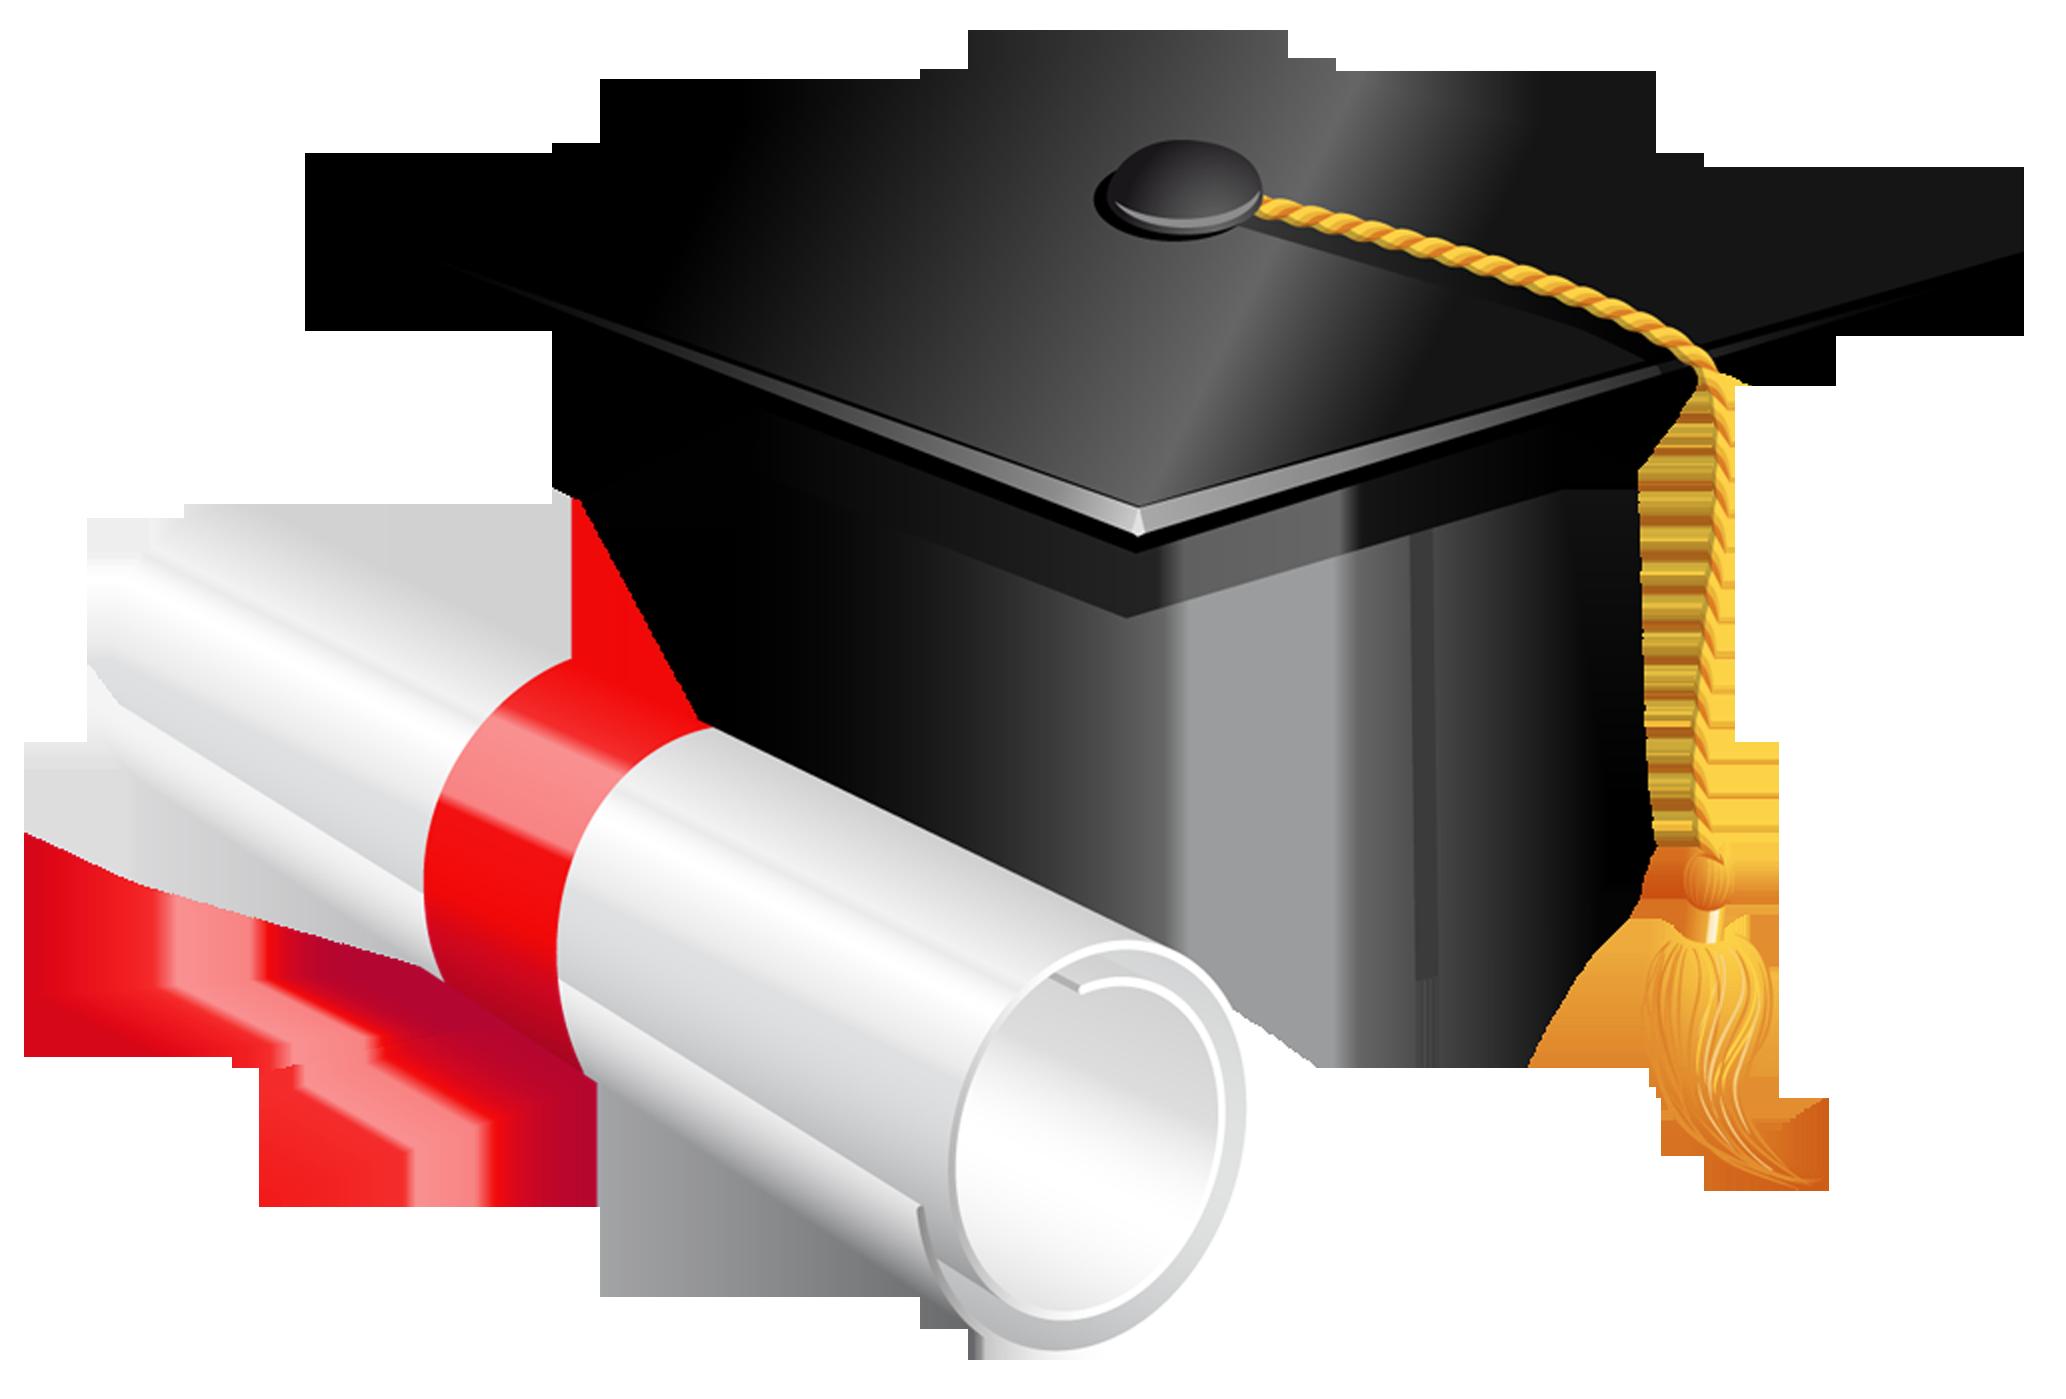 High school diploma clipart image transparent download 28+ Collection of High School Diploma Clipart | High quality, free ... image transparent download